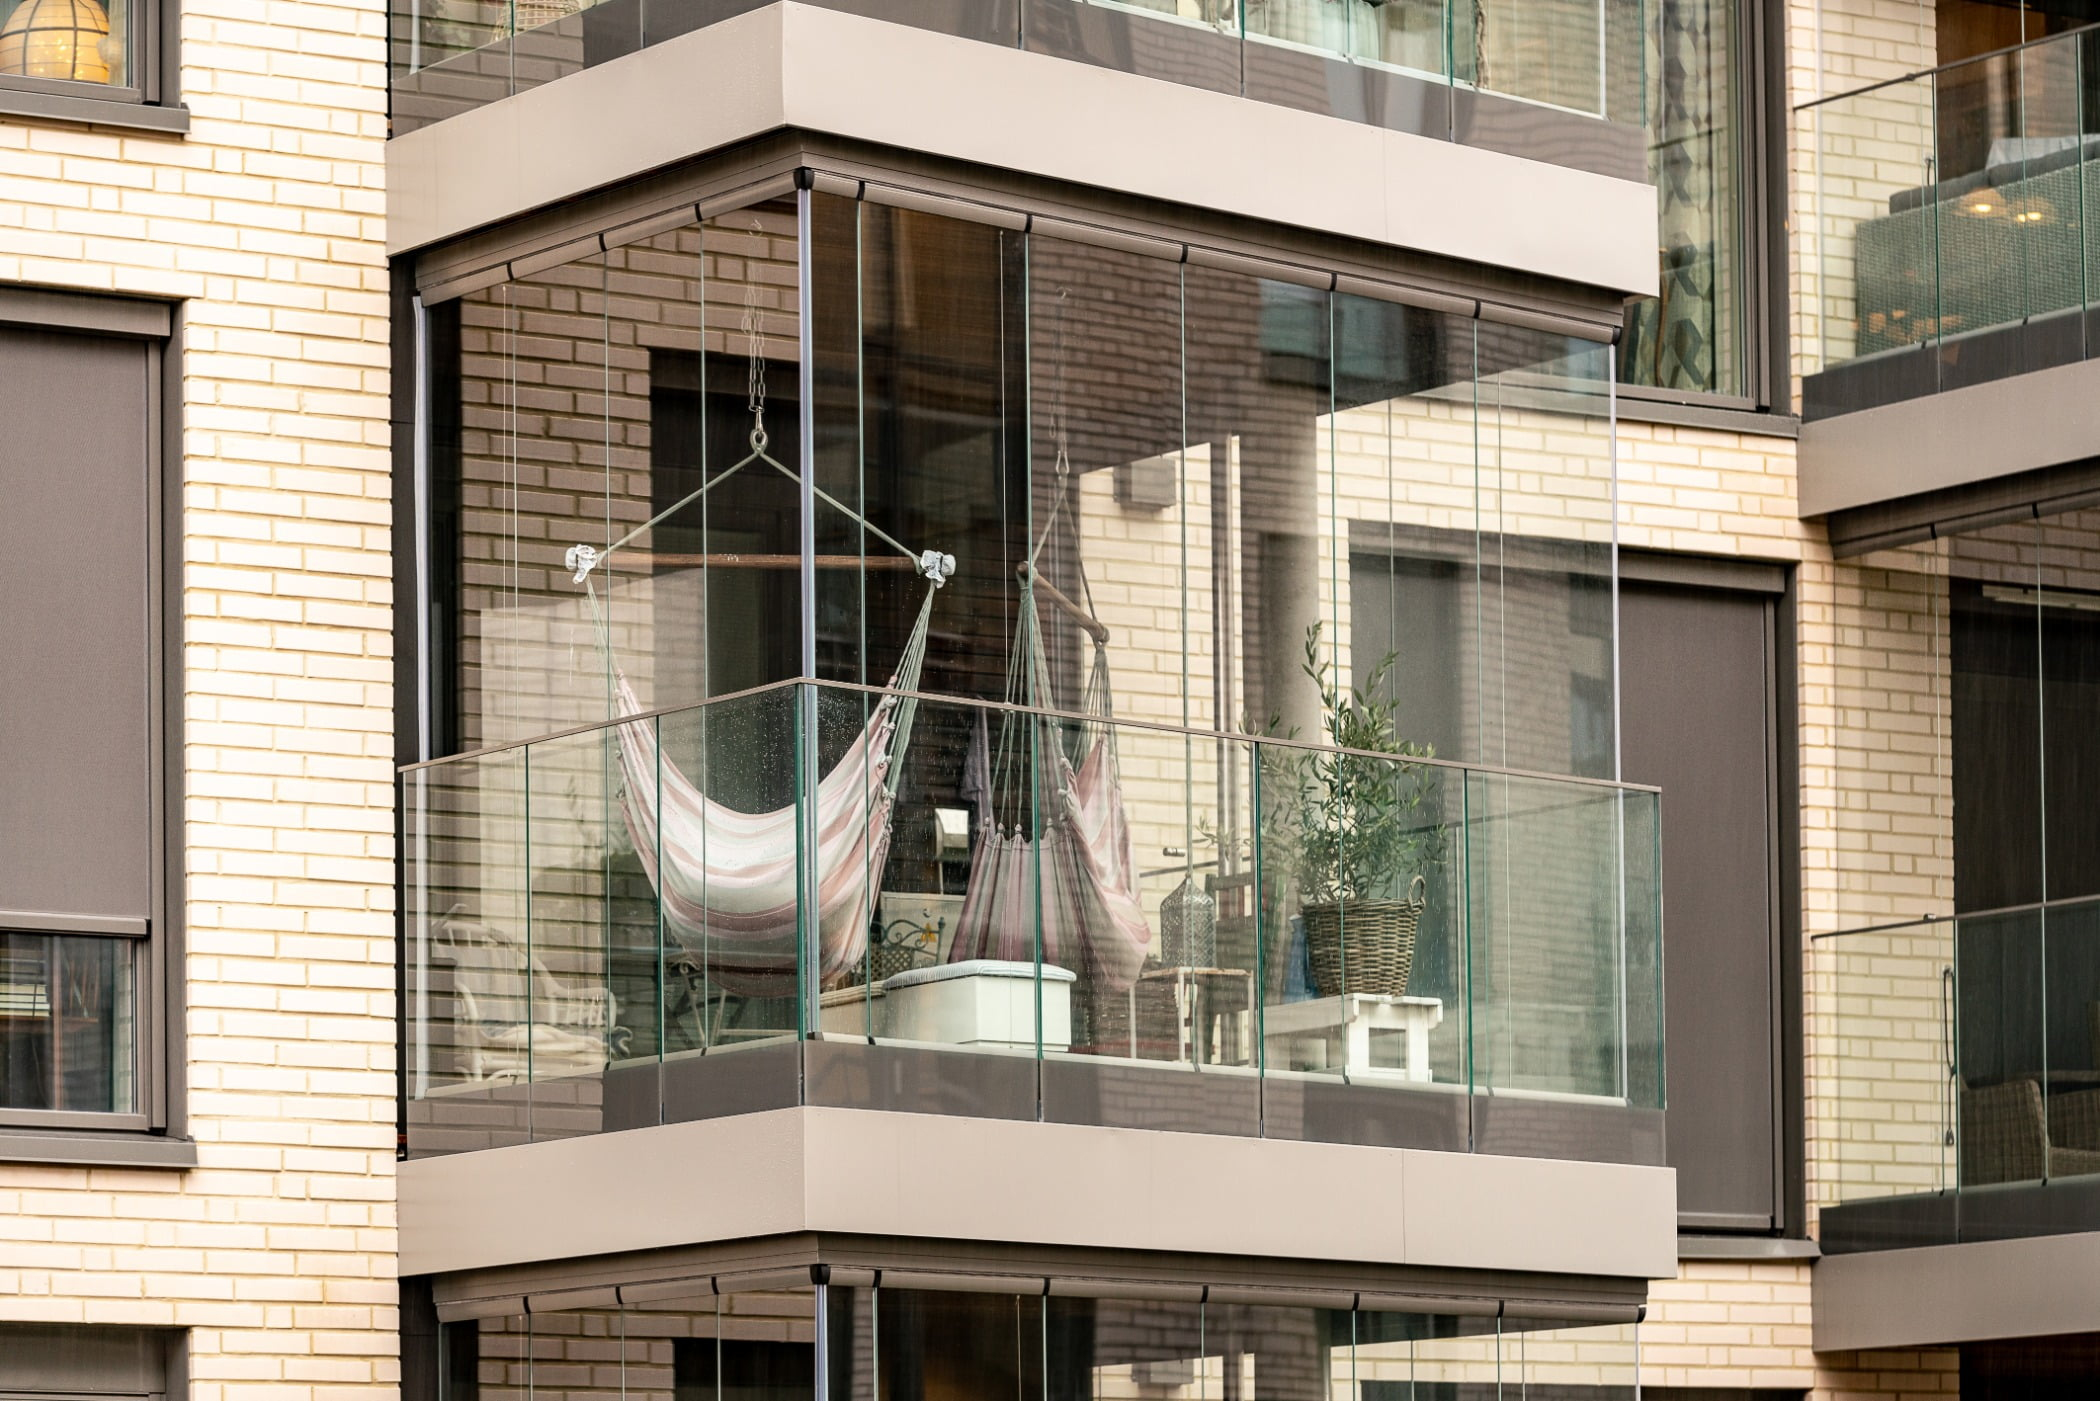 Urban design, Tower block, Residential area, Property, Building, Window, Architecture, Condominium, Line, Fixture